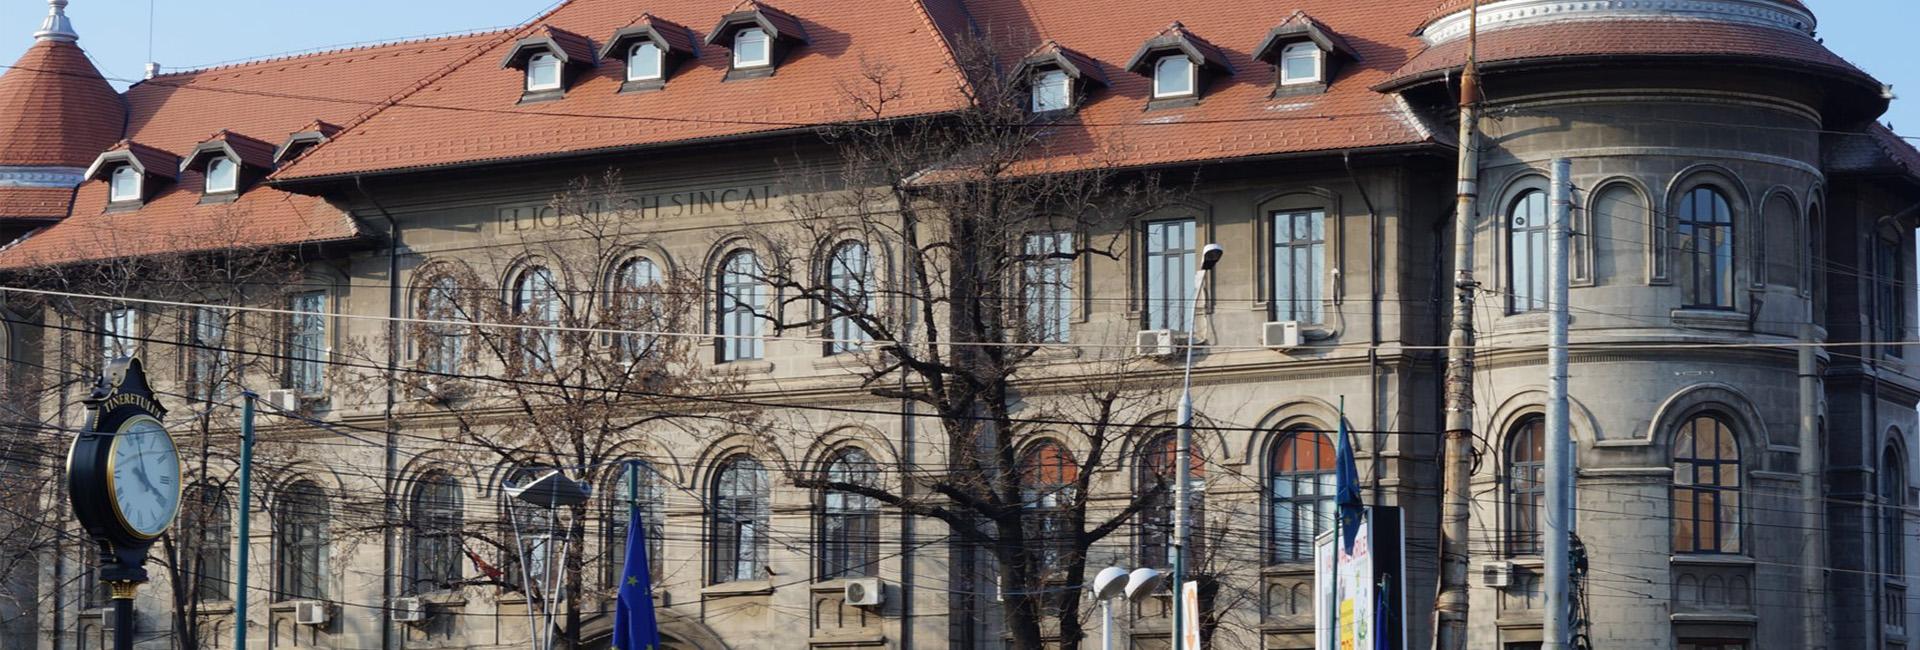 Colegiul National Gheorghe Sincai slider Matricea Romaneasca